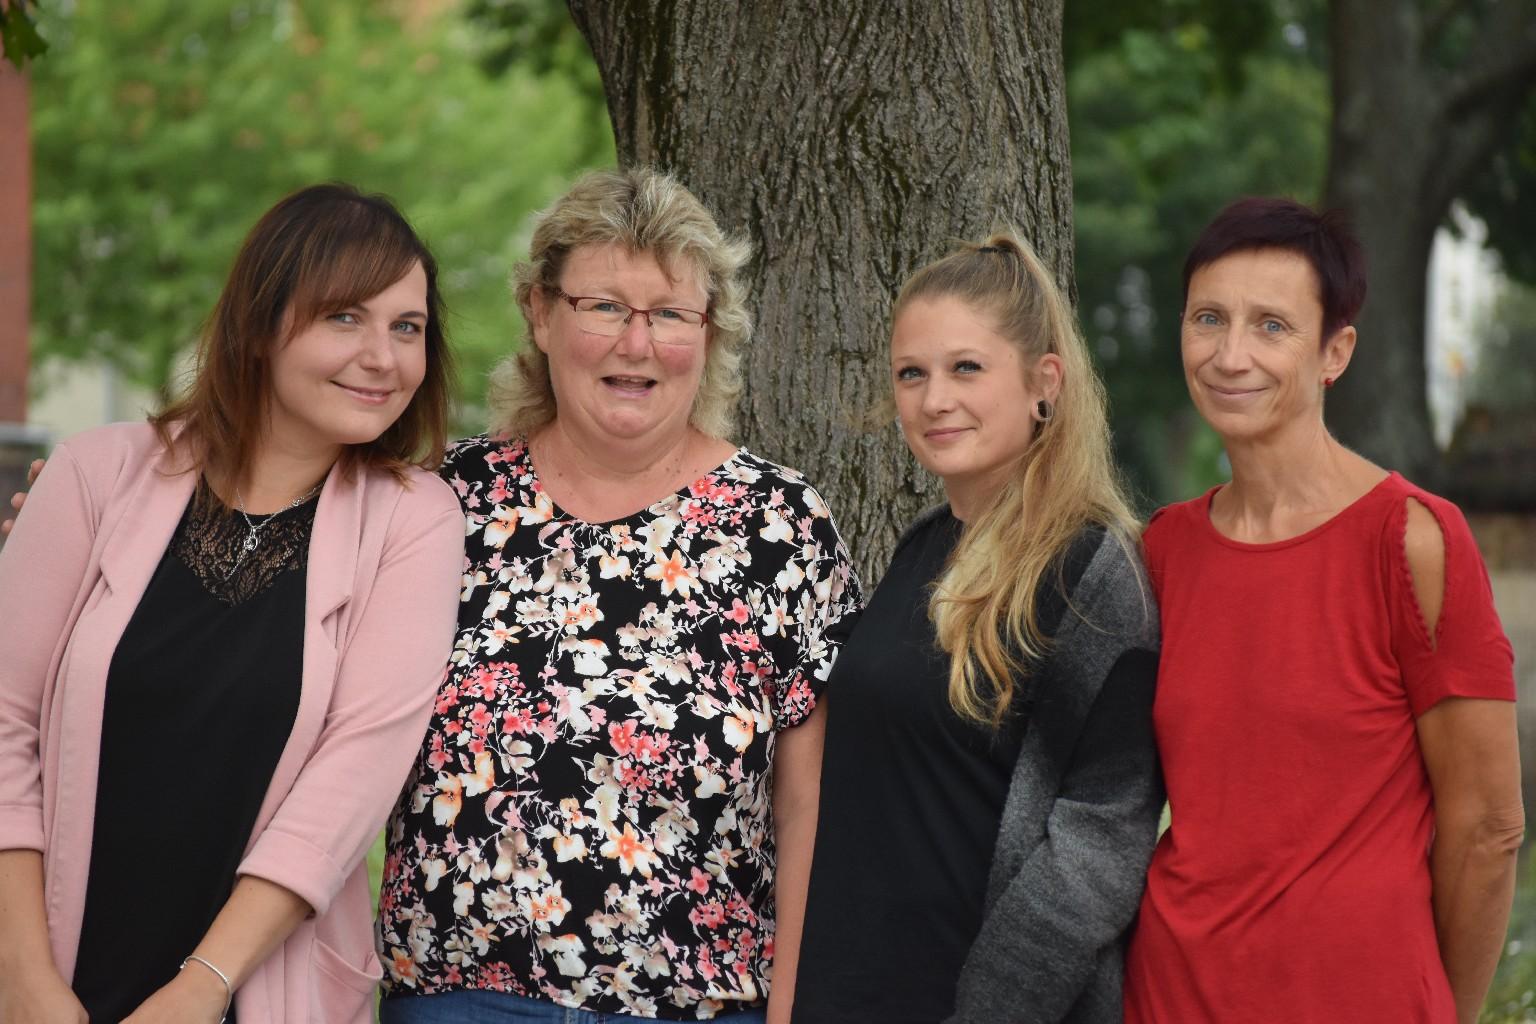 Erzieherinnen der 2. Klassen - Frau Schattschneider, Frau Rockstroh, Frau Nowak, Frau Berger